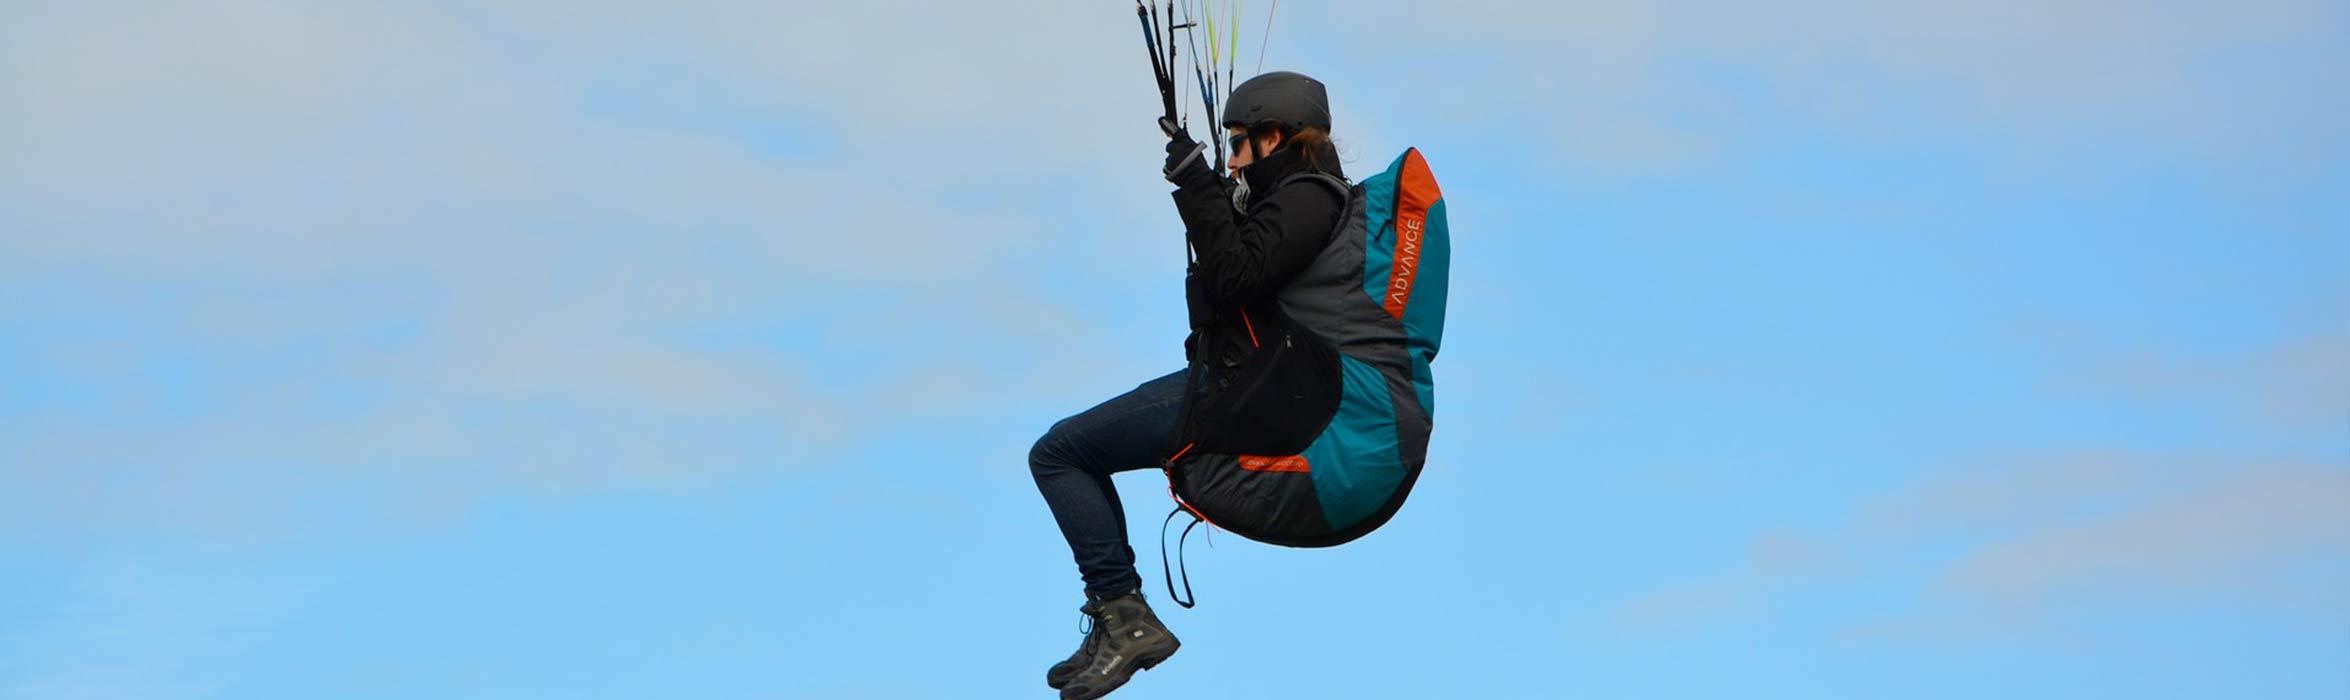 sellettes-atom-paragliding